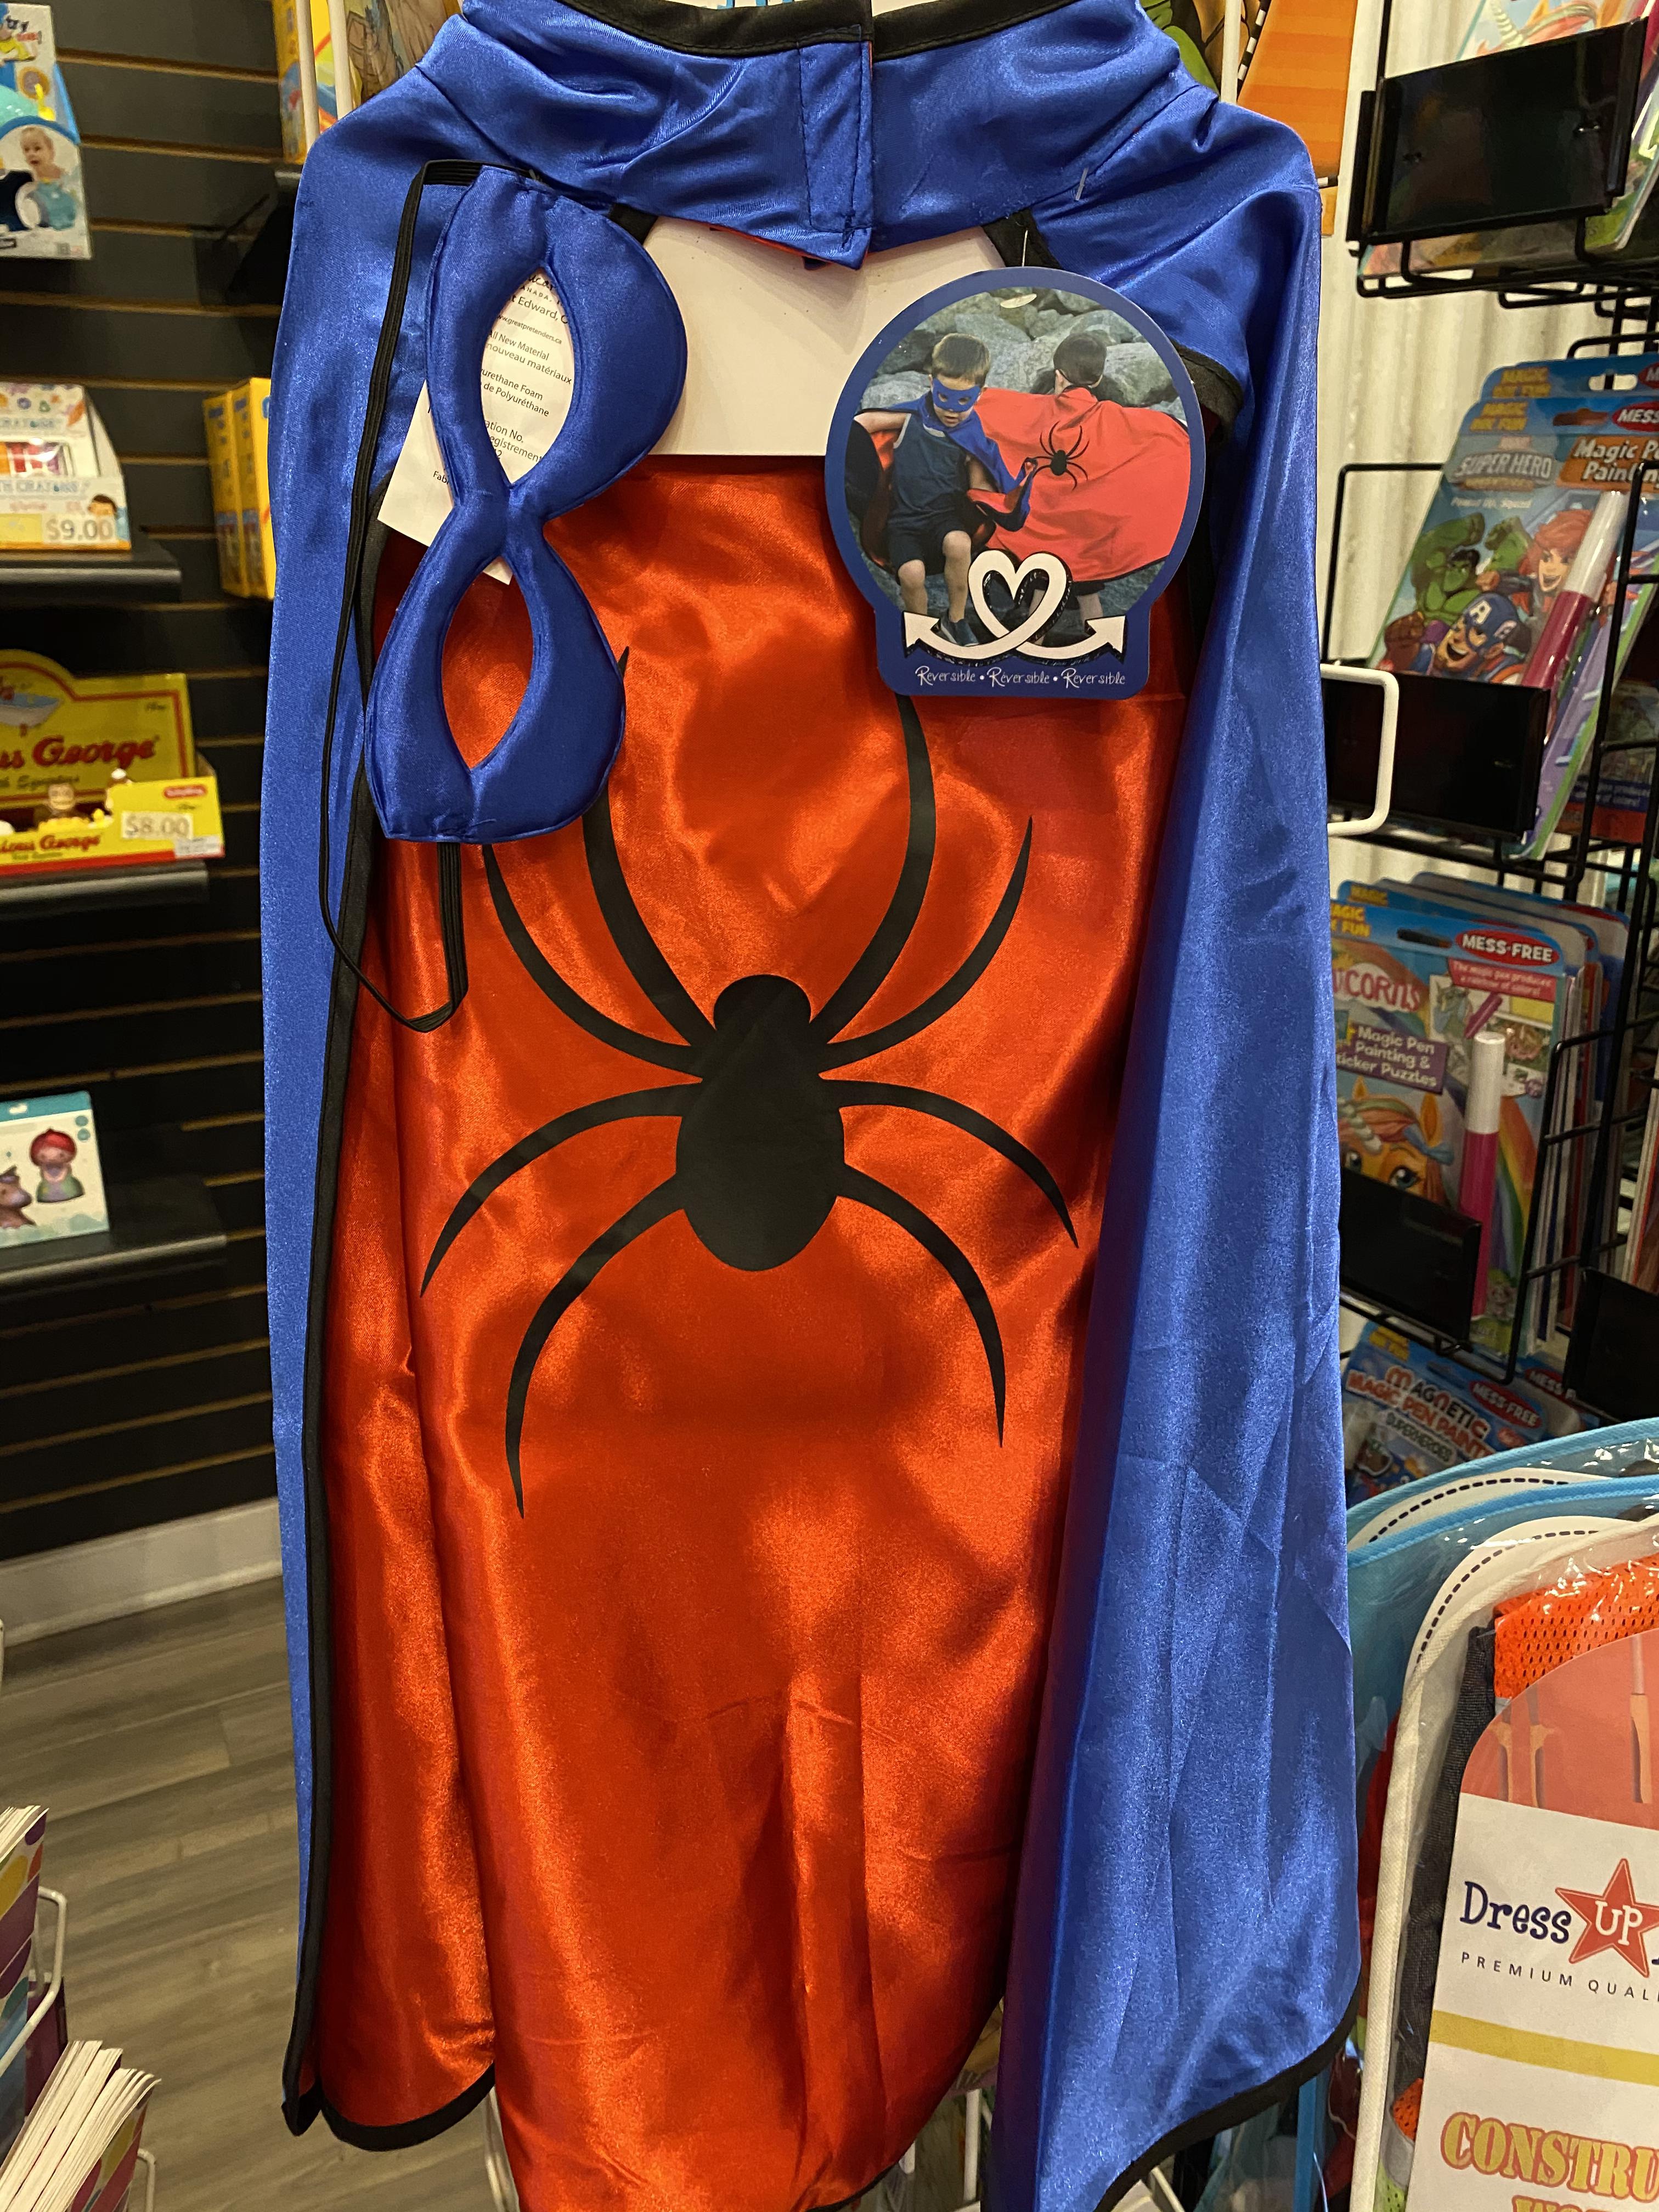 DRESS UP SPIDER-MAN REVERSE